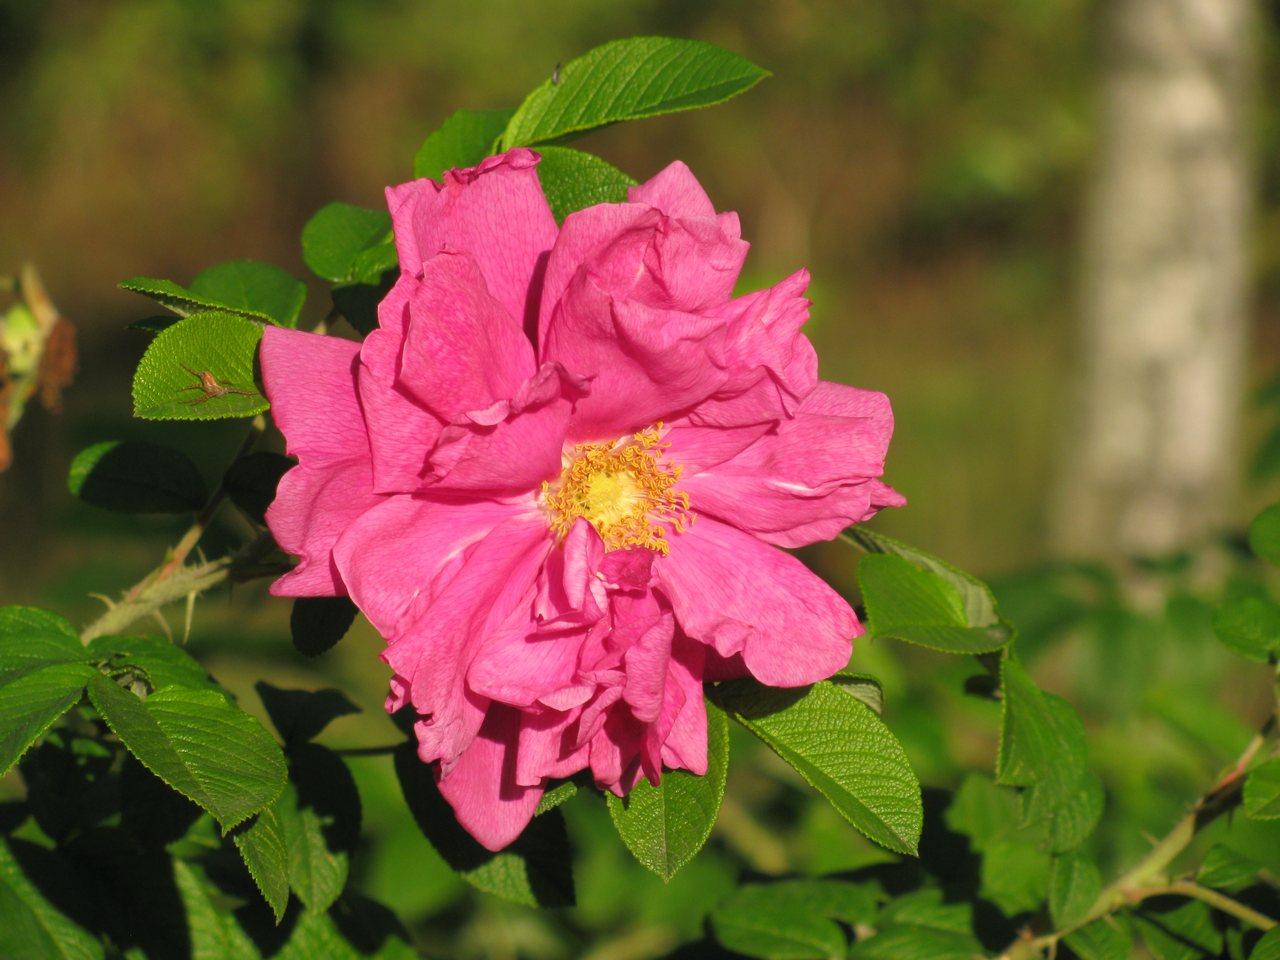 roża dzika